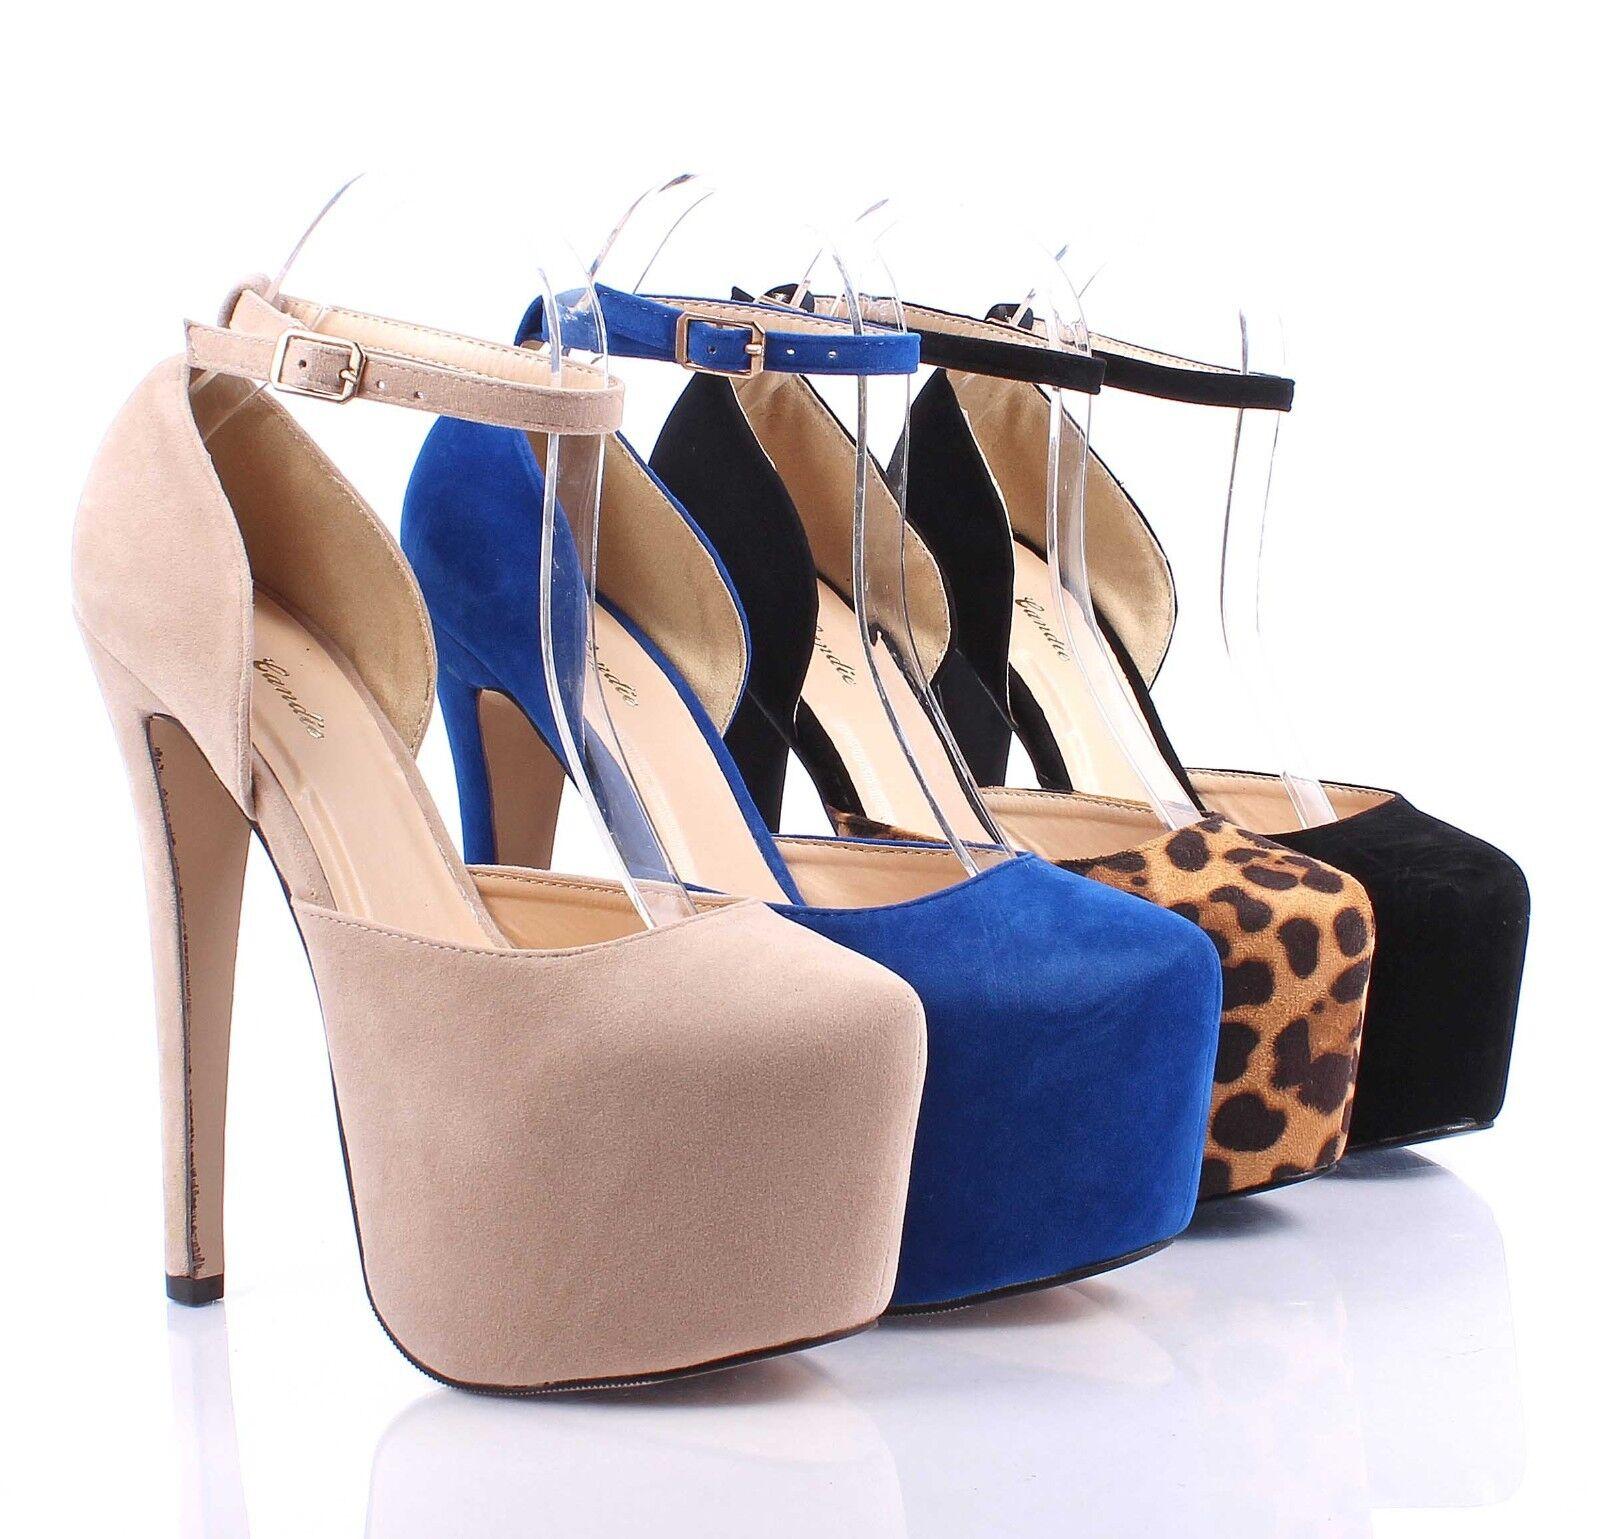 Fashion Stilettos Faux Suede Strap Buckle Pump Party Sexy Womens 6.5  High Heels